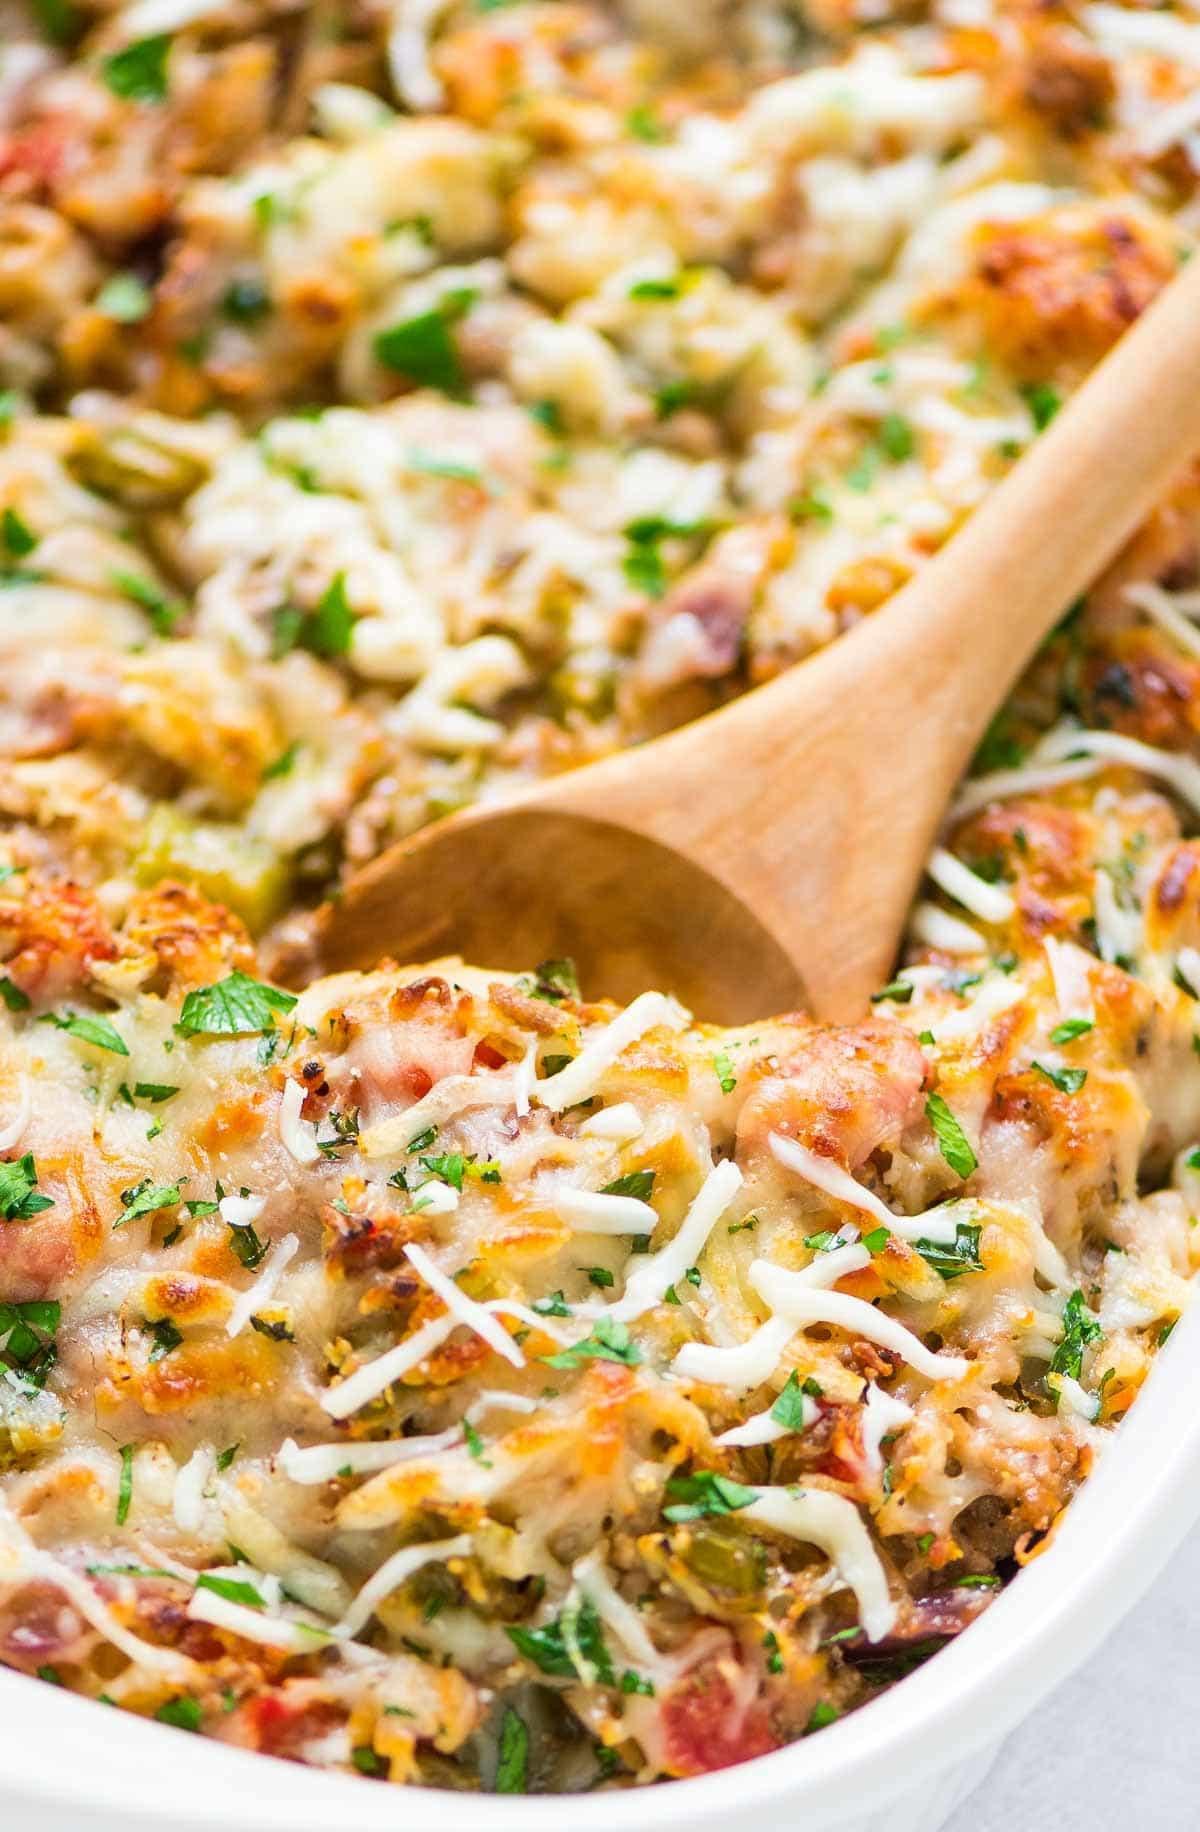 Low Carb Spaghetti Squash Recipes  Spaghetti Squash Casserole